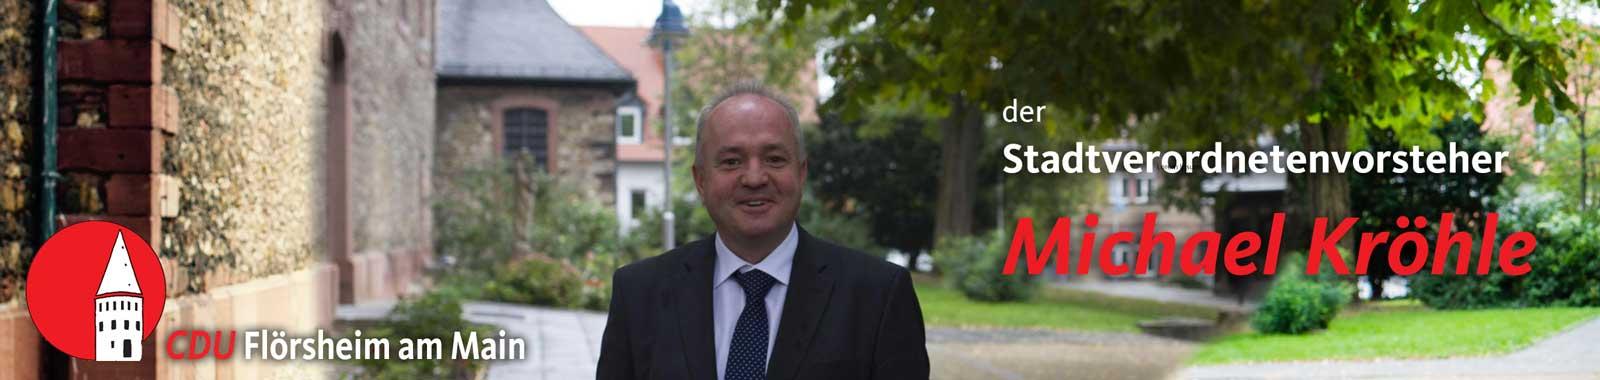 CDU Flörsheim gratuliert: Michael Kröhle wird 50 Jahre alt